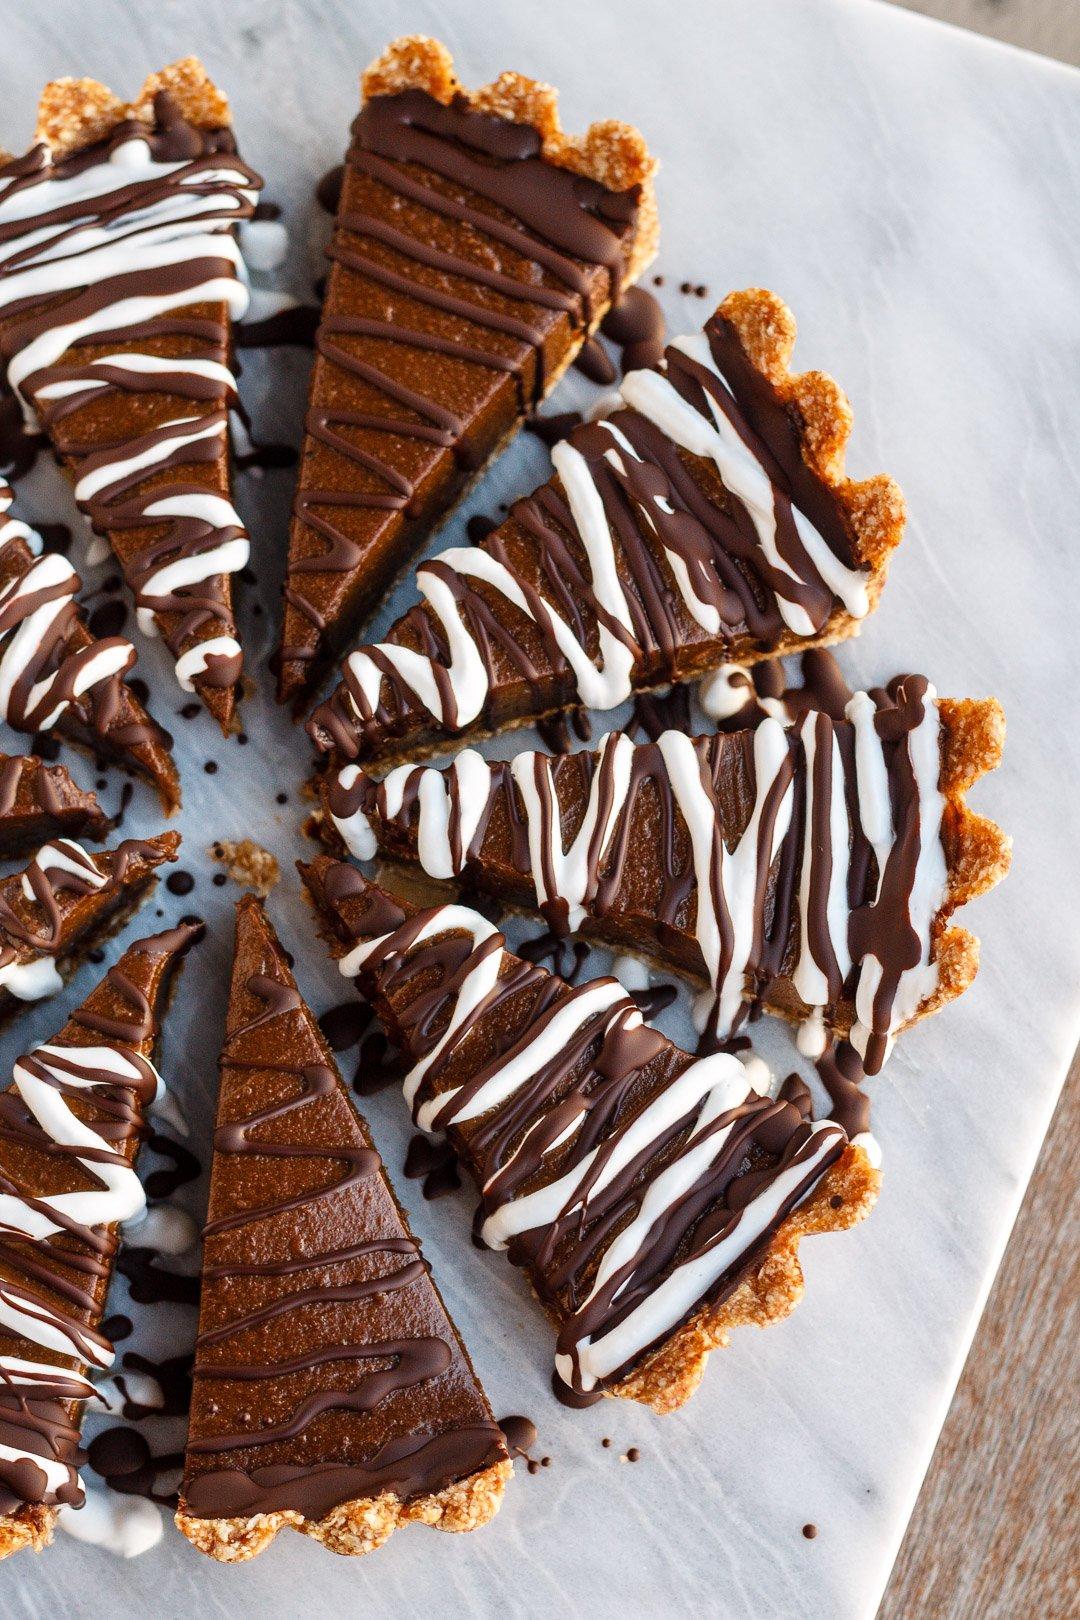 Chocolate avocado tart